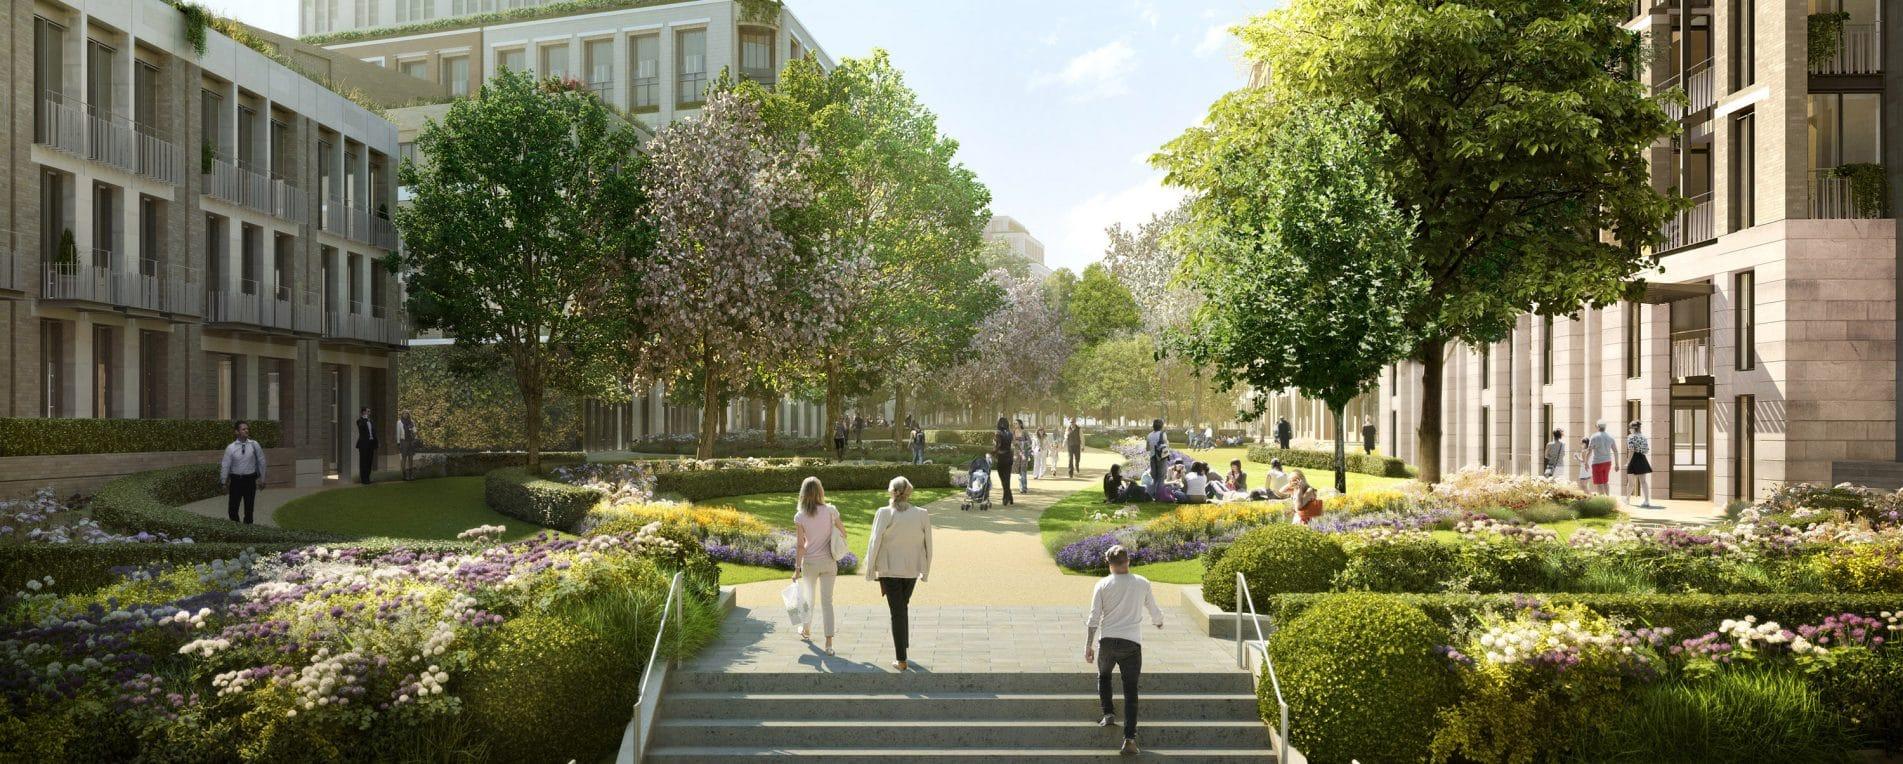 plans for lost river park revealed